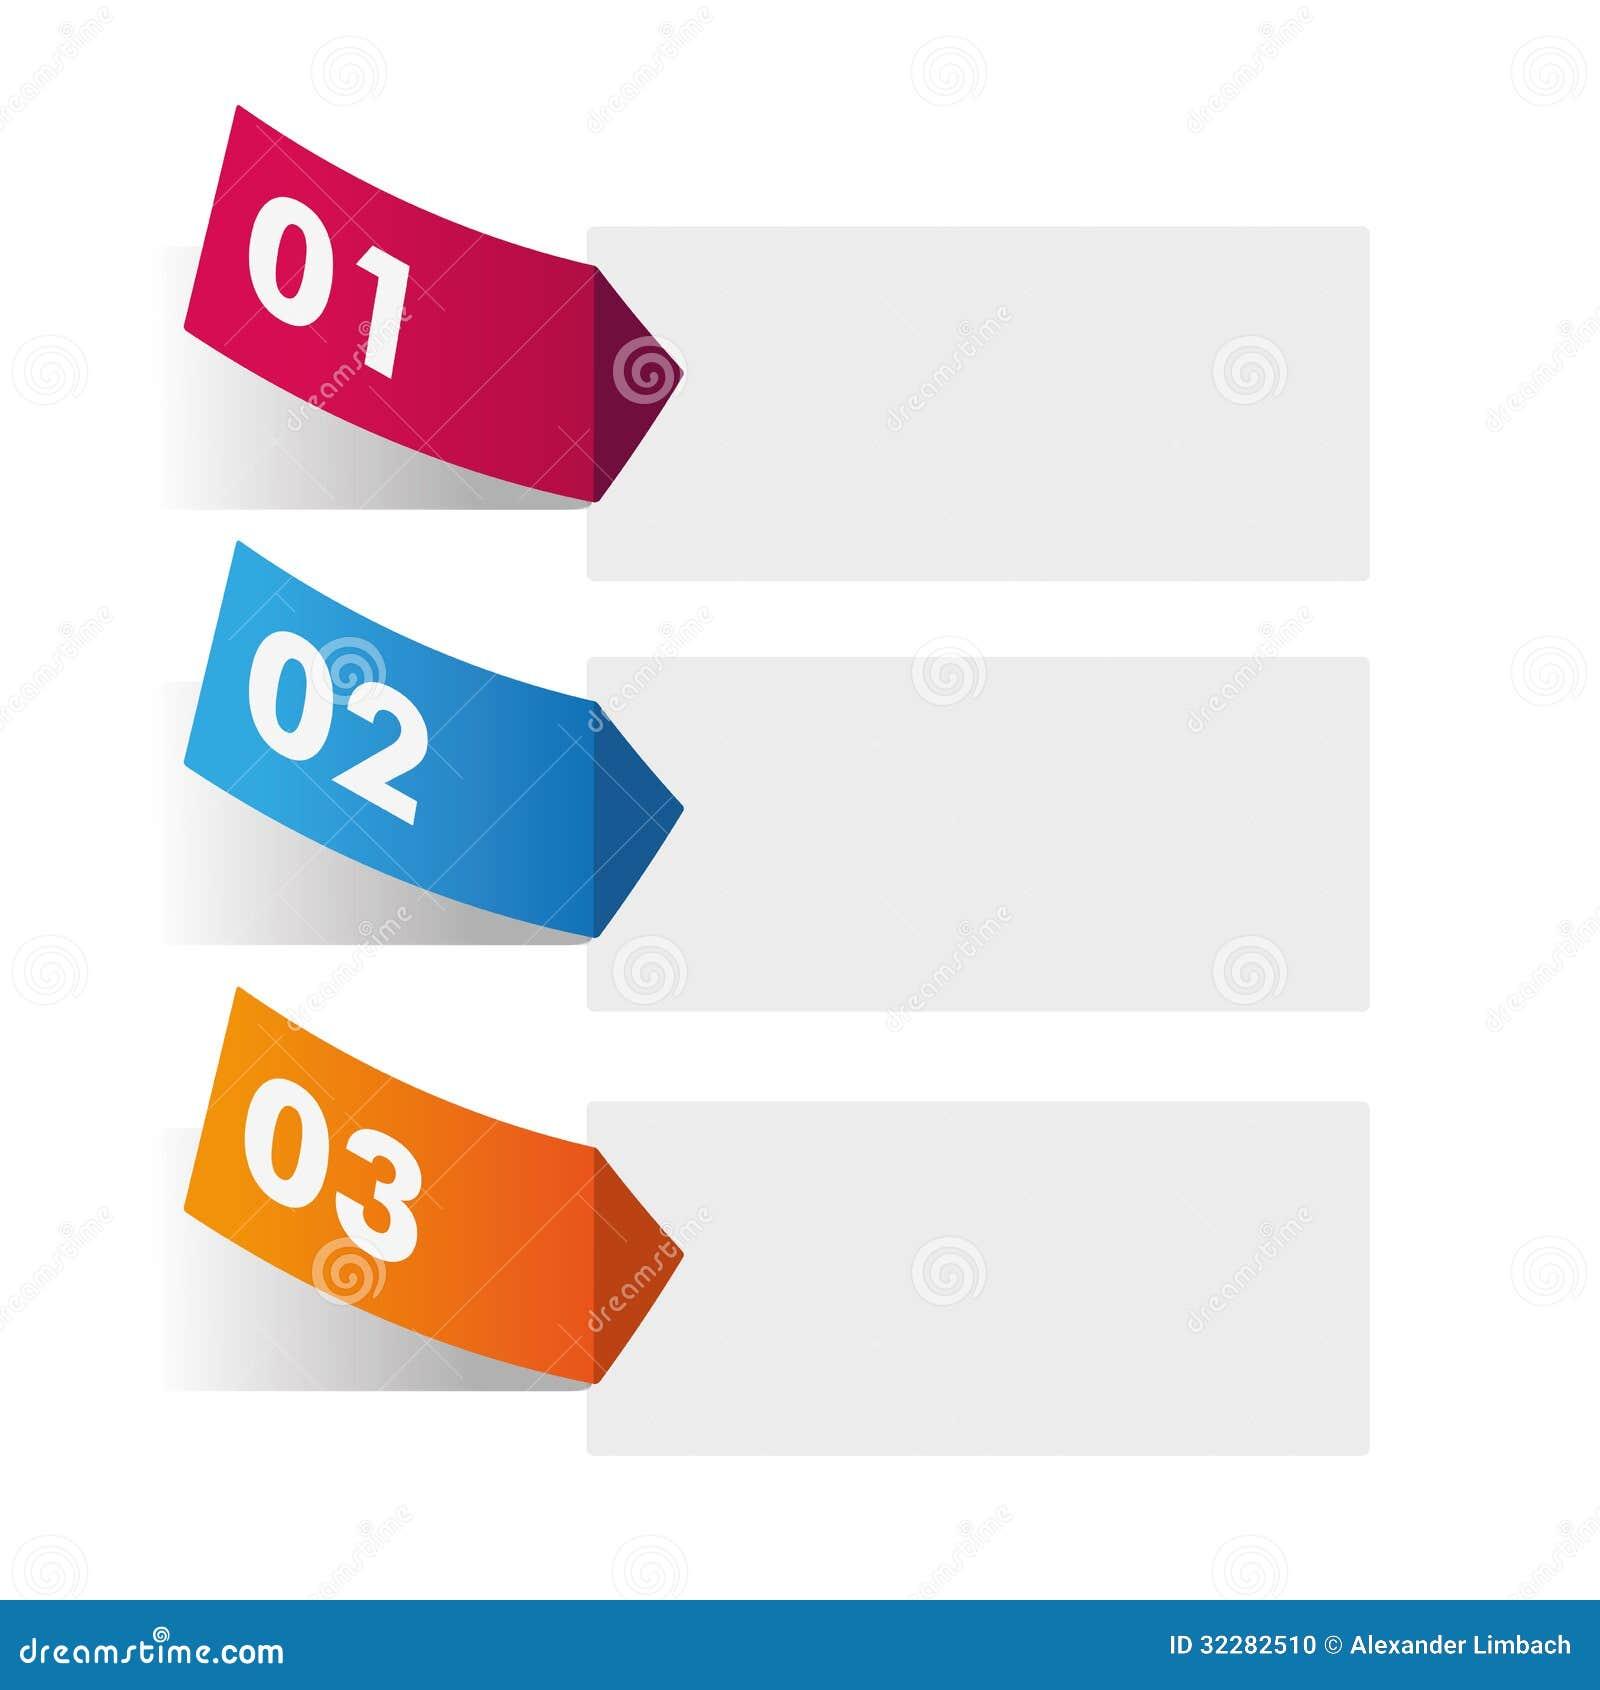 ·• Diversos Materiales y opciones de acabado. CODIGO DE SERIE NUMERO DE SERIE LB B 01 AA CI A 01M RESORTES DE EXTENSION Serie SERIE INSTRUMENTAL (Pulgadas) EI Lee Spring Stock Springs with the exception of Cadmium Plated MIL-SPEC Springs, are manufactured RoHS radiohitzfm.tk radiohitzfm.tk